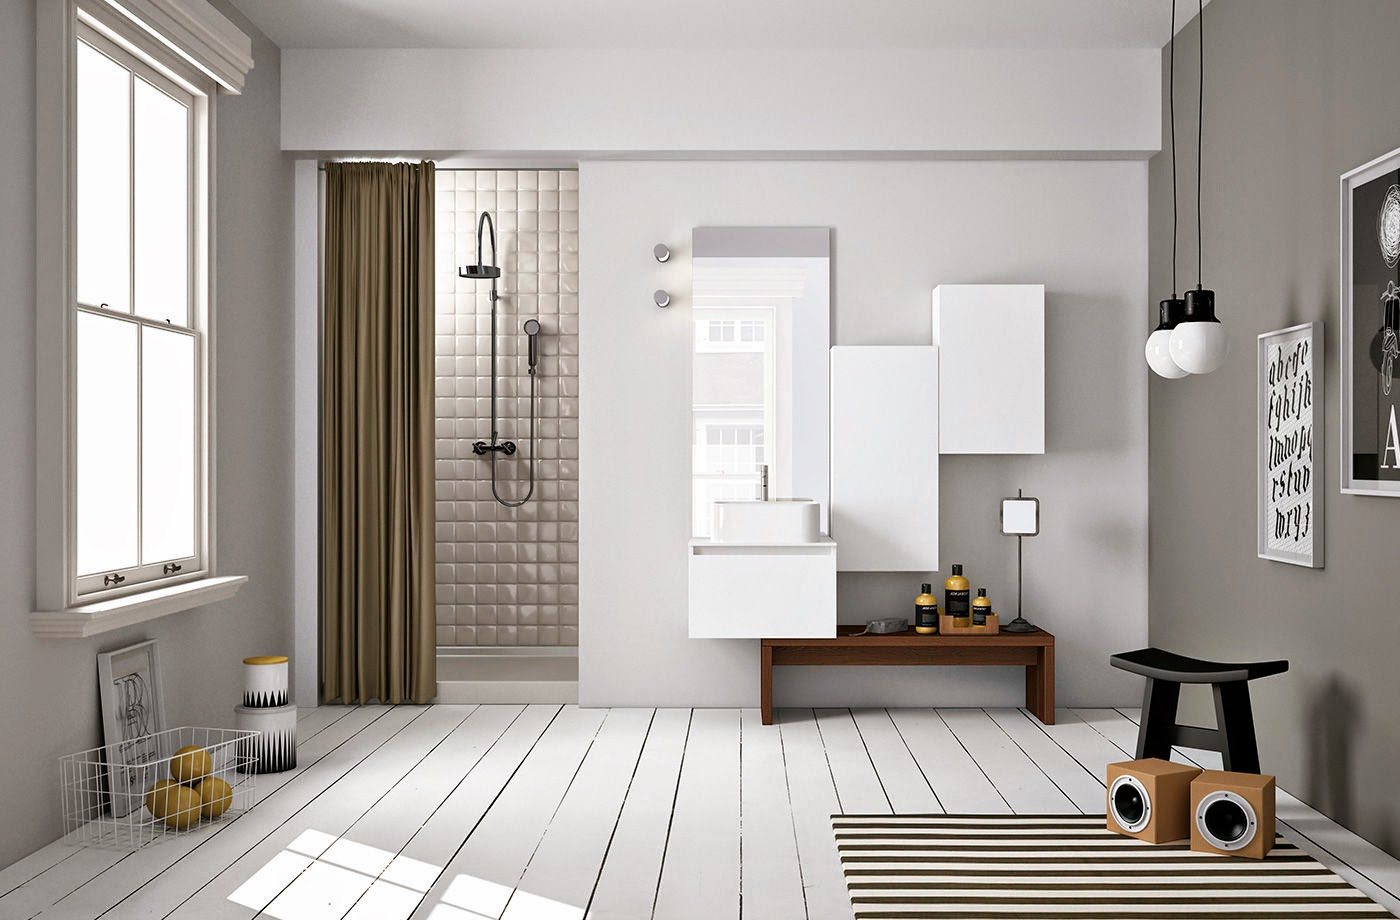 30 Baos Nrdicos Inspiracin Escandinava Interiors Inside Ideas Interiors design about Everything [magnanprojects.com]